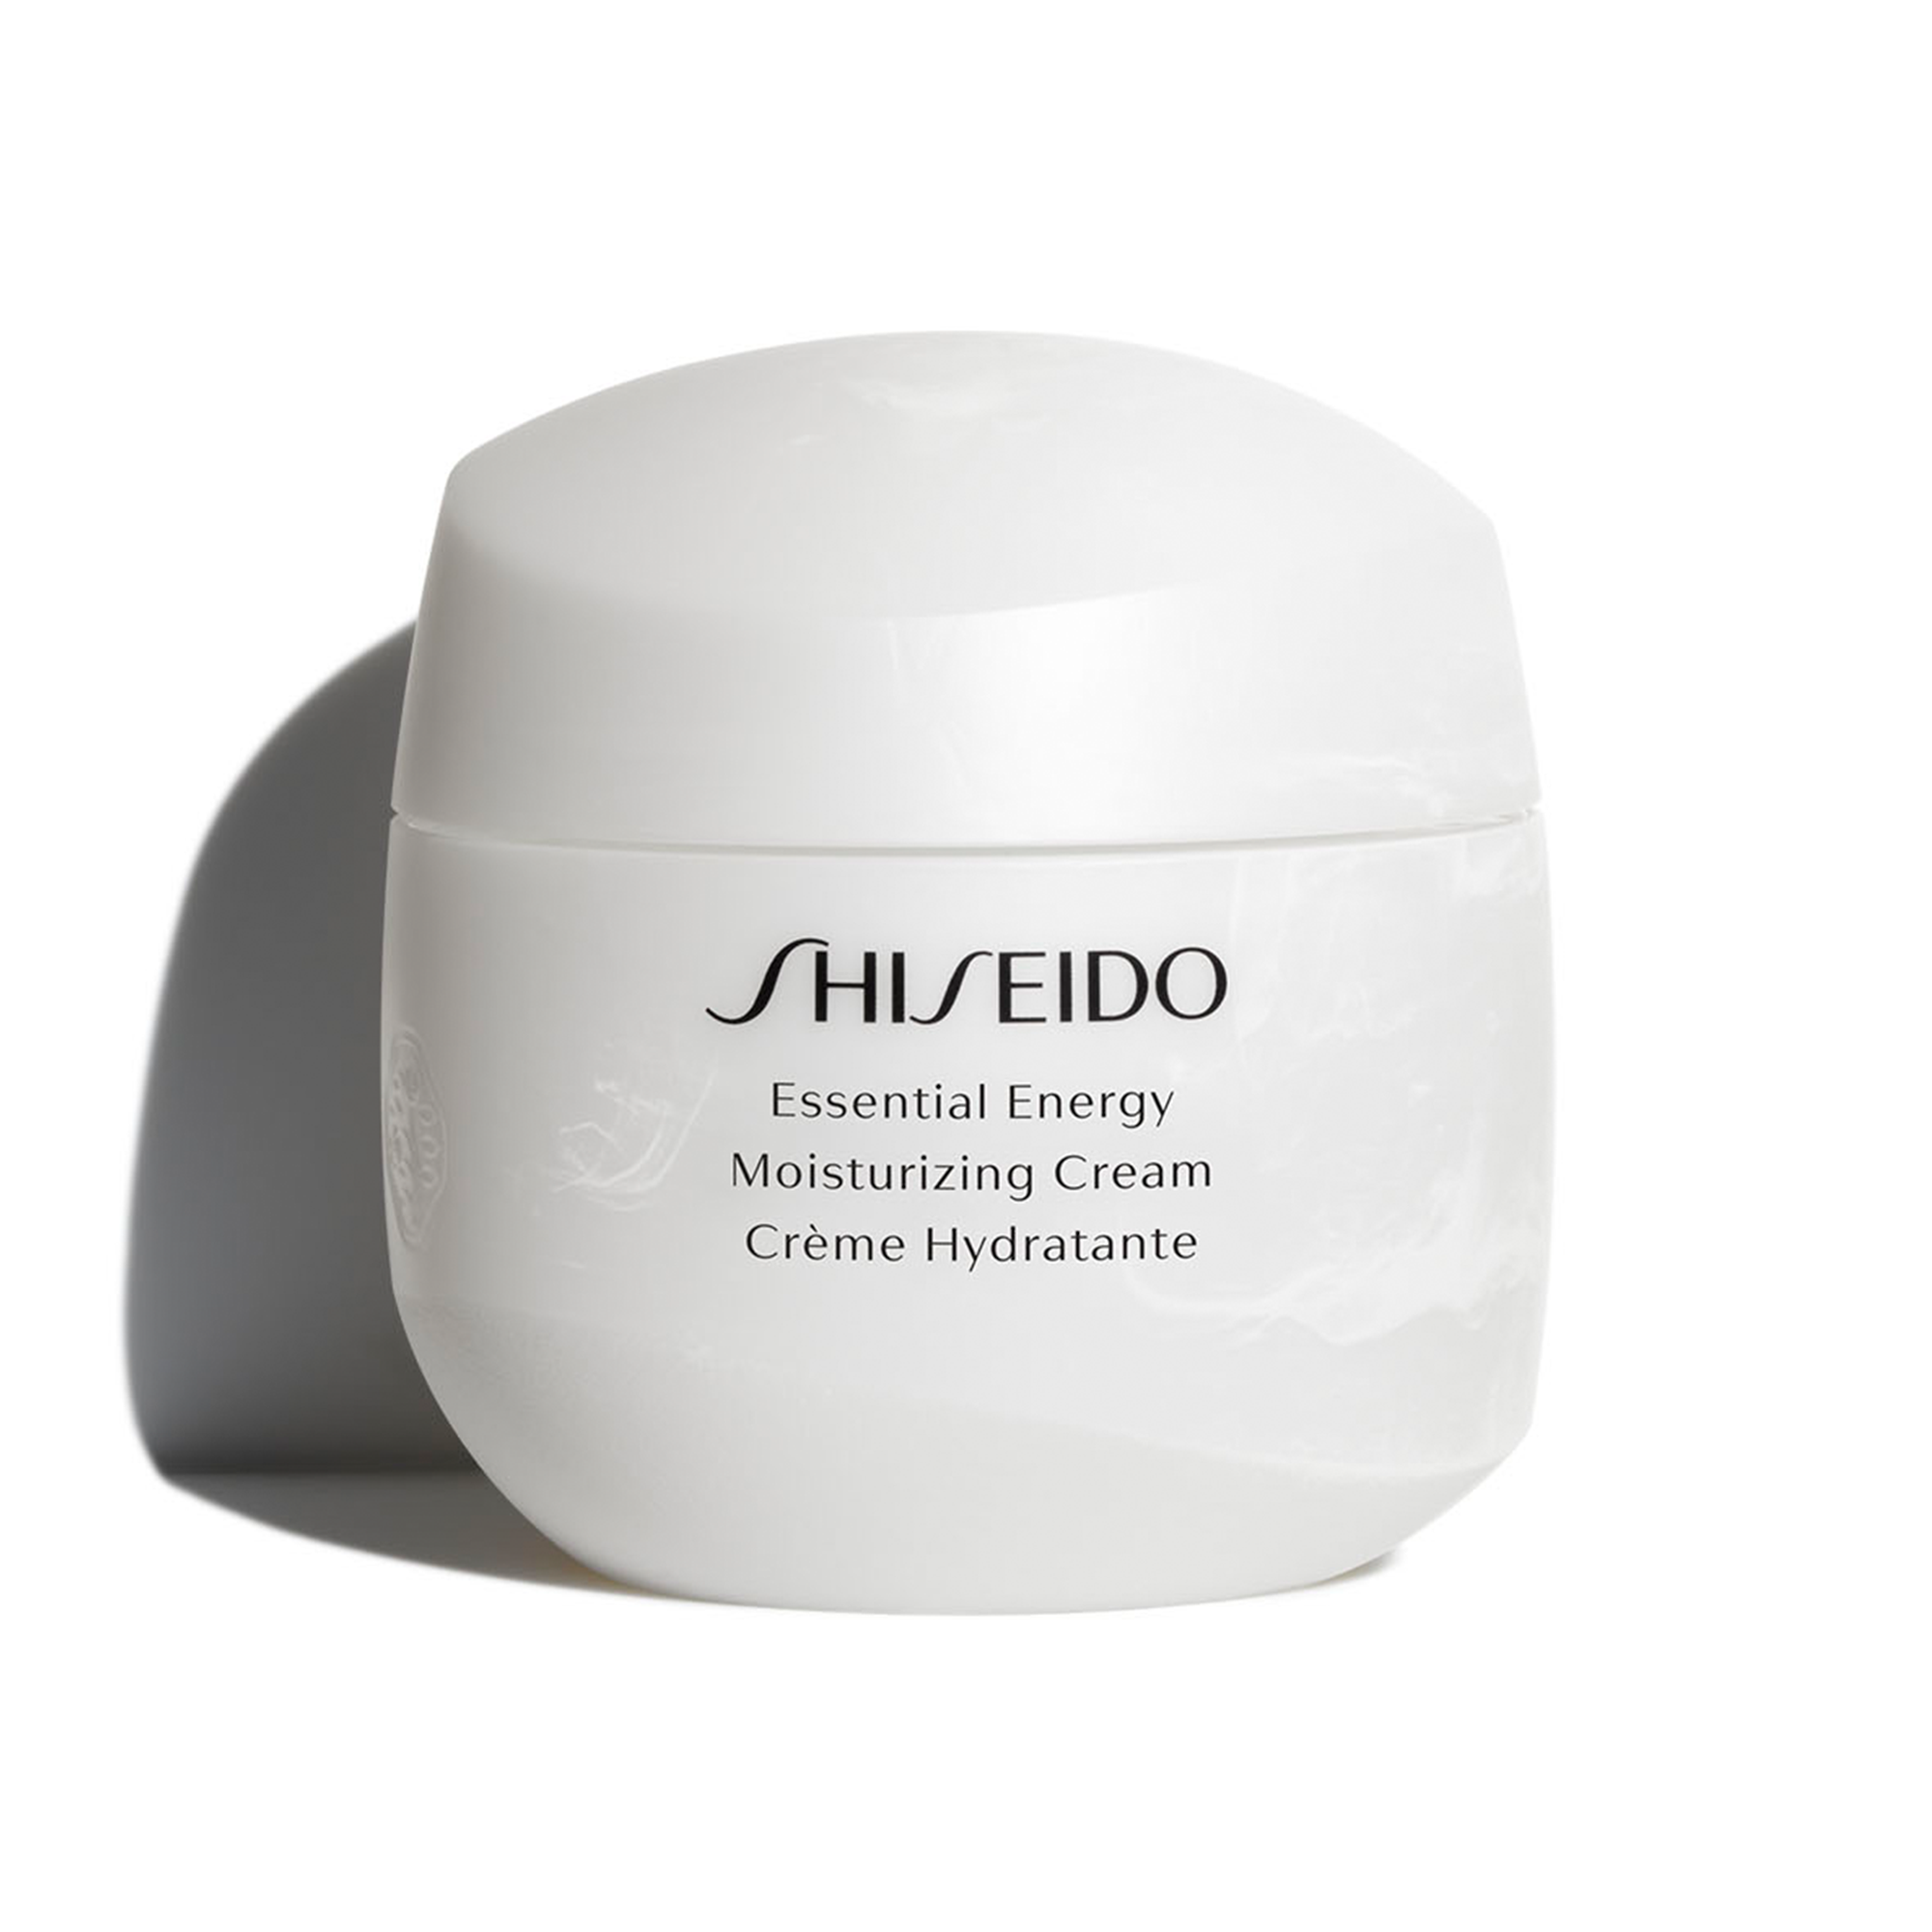 Essential Energy Moisturizing Cream 50ml